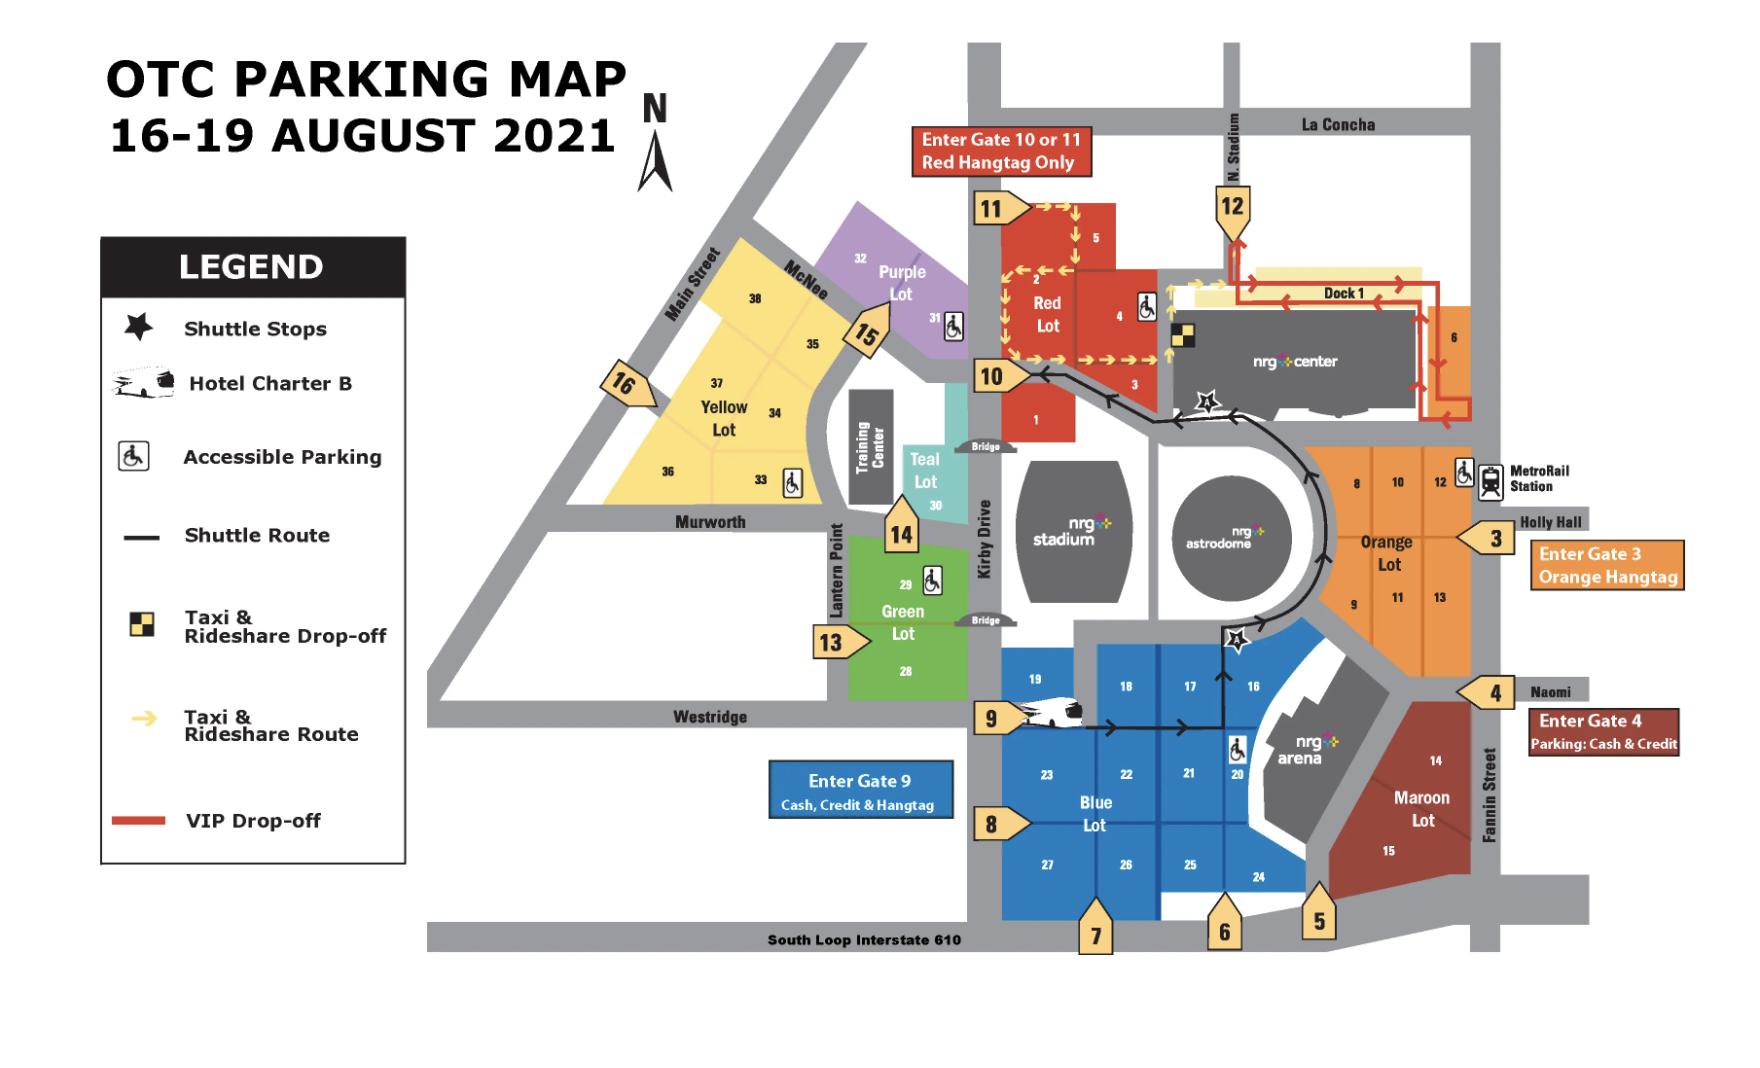 OTC 2021 Houston OTC NRG map